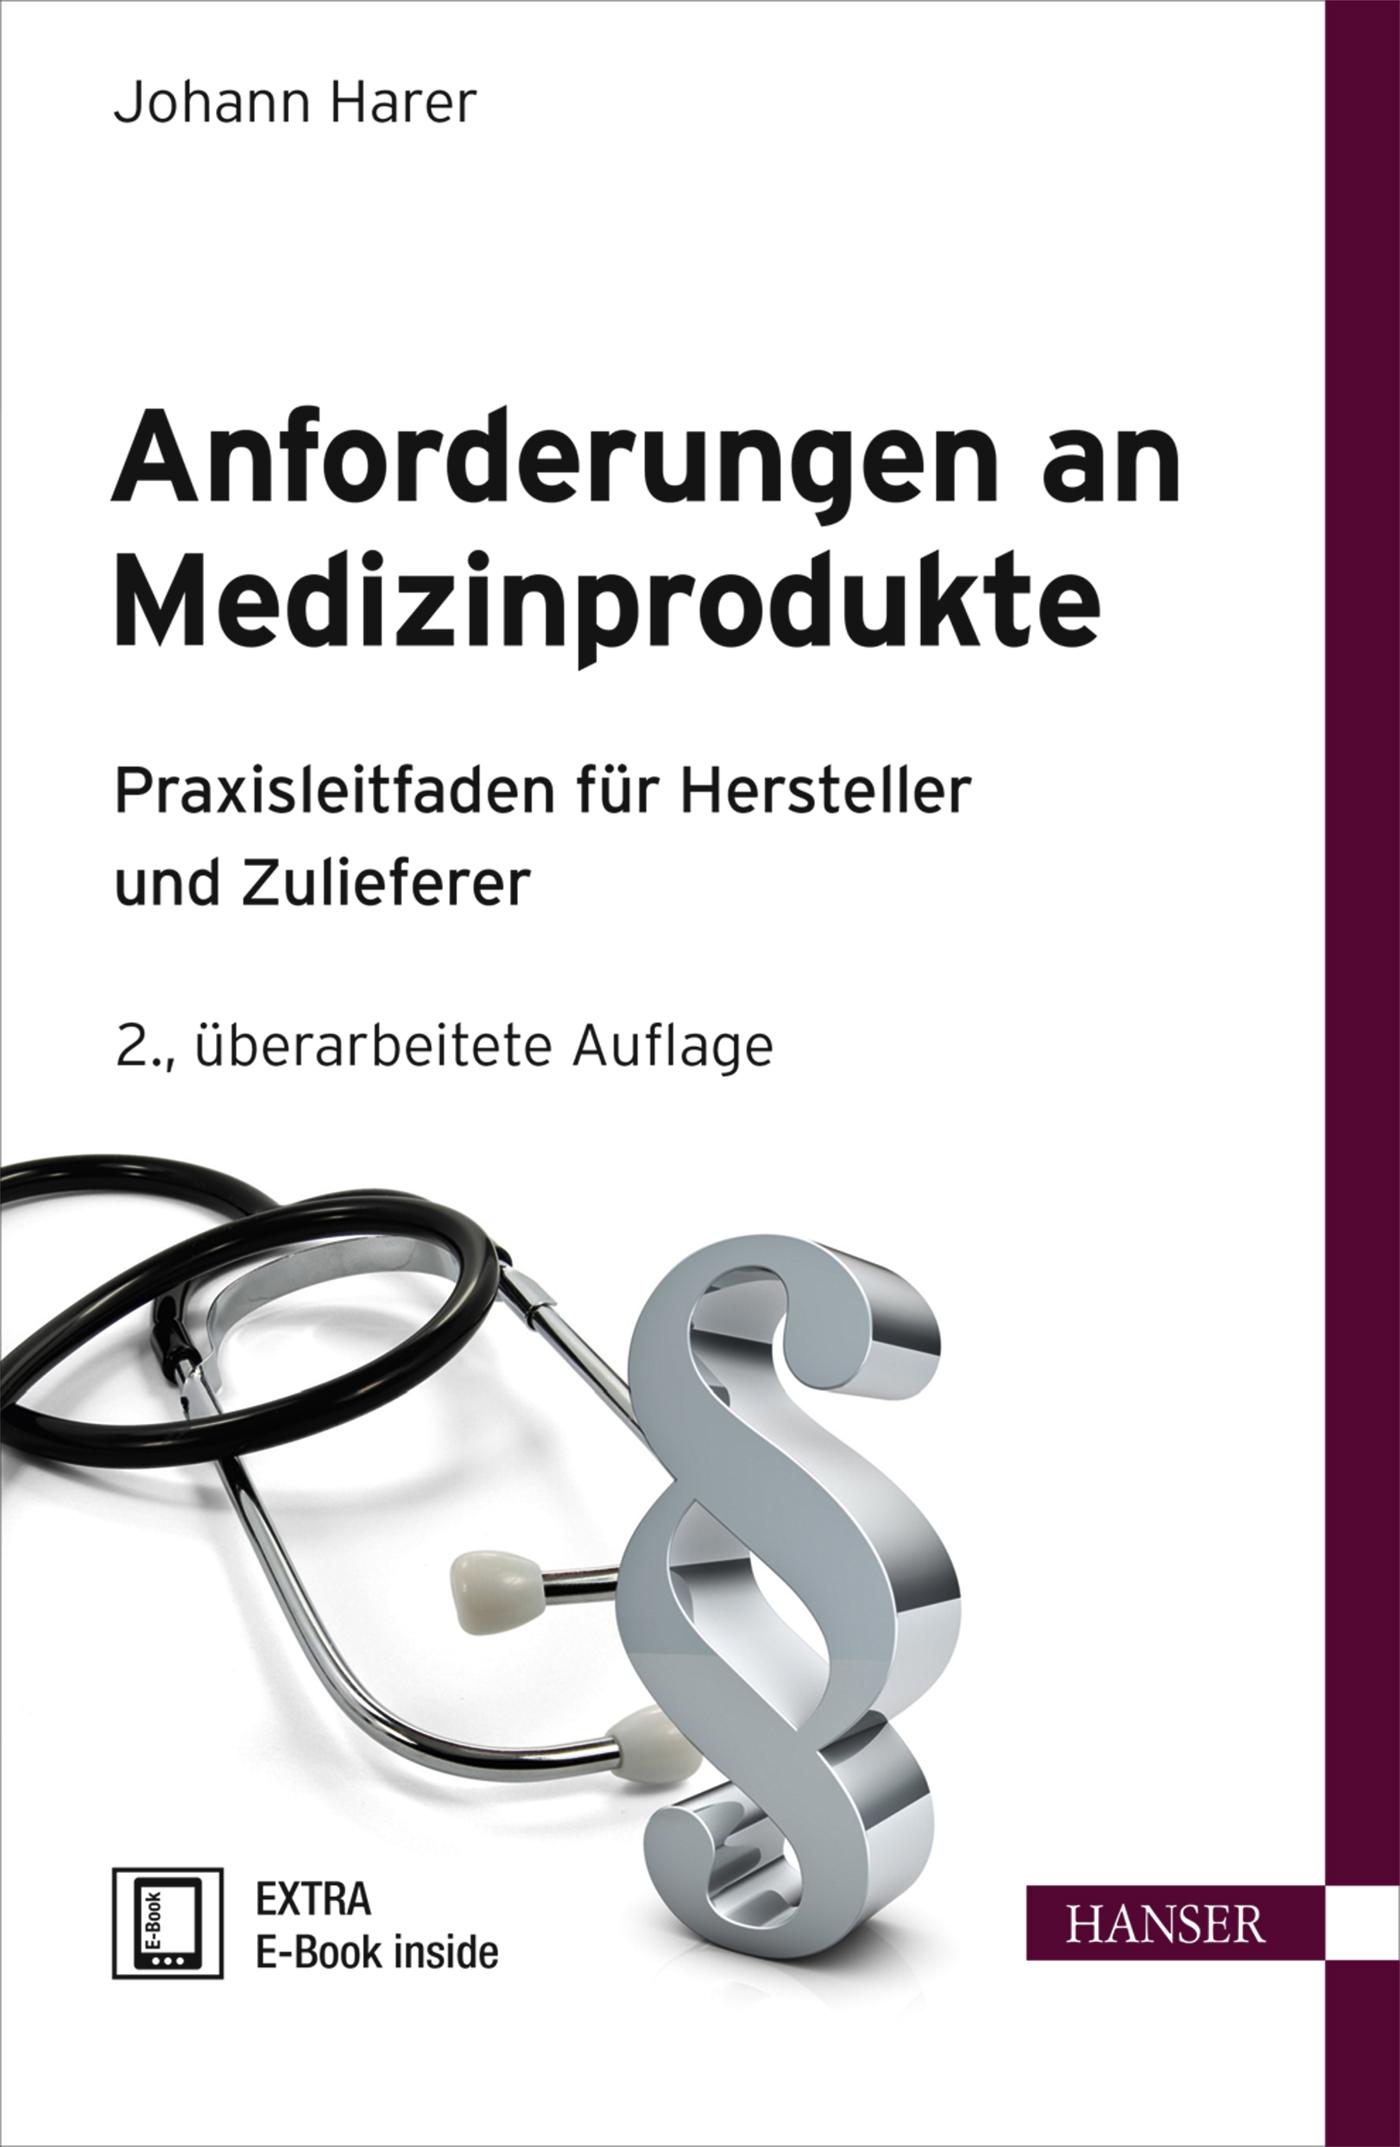 Harer, Anforderungen an Medizinprodukte, 978-3-446-44041-8